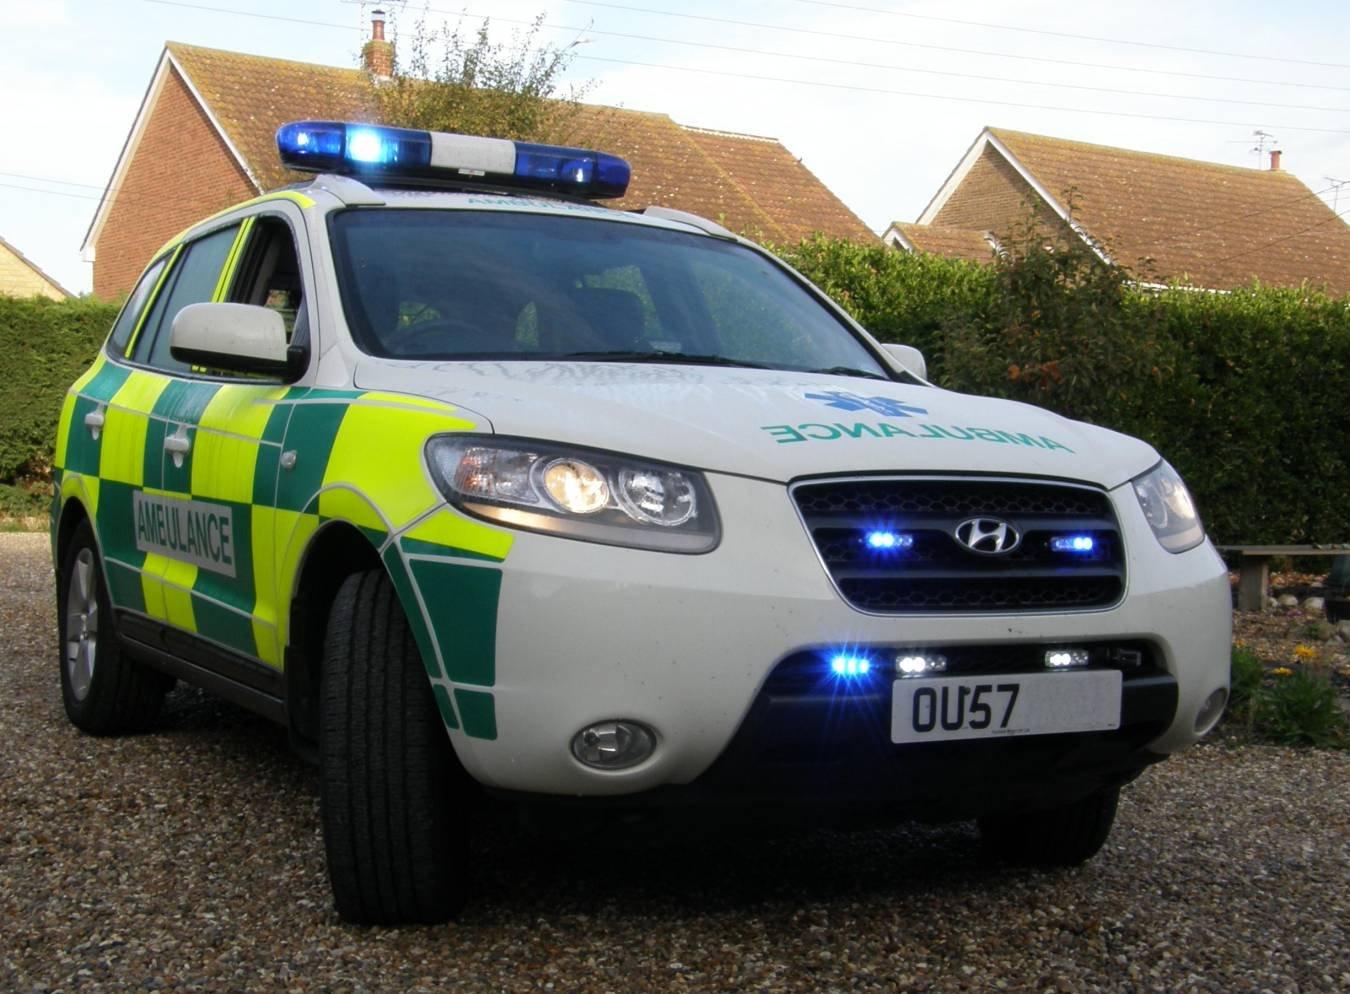 Hyundai Santa Fe Strobe Police Lights for Headlamps Headlights Head Lamps Lights Strobes